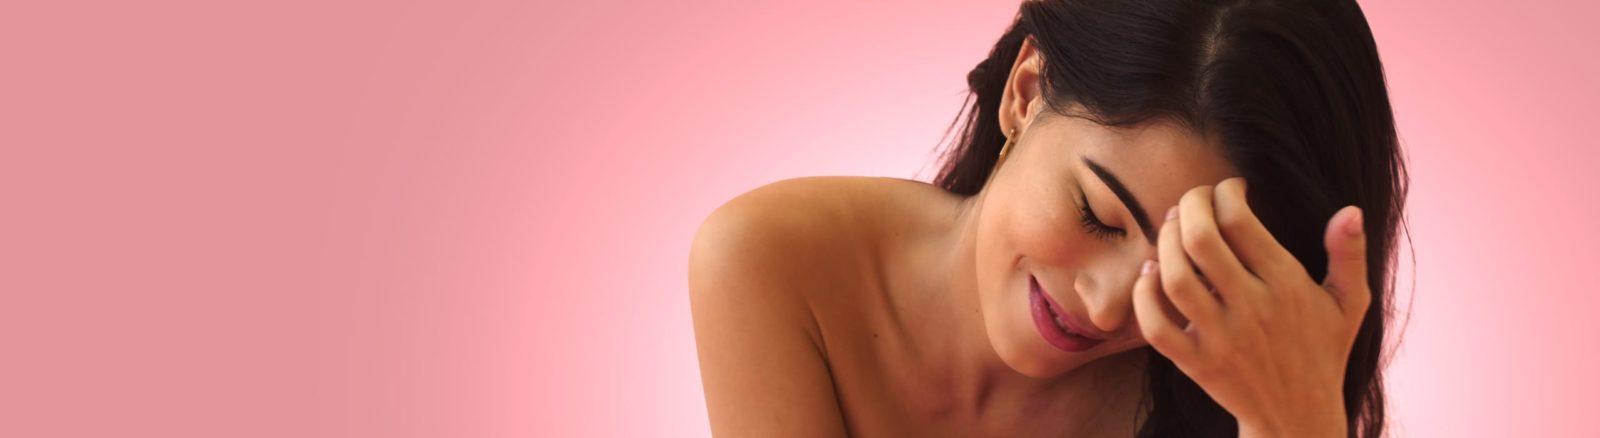 woman with full, beautiful eyebrows